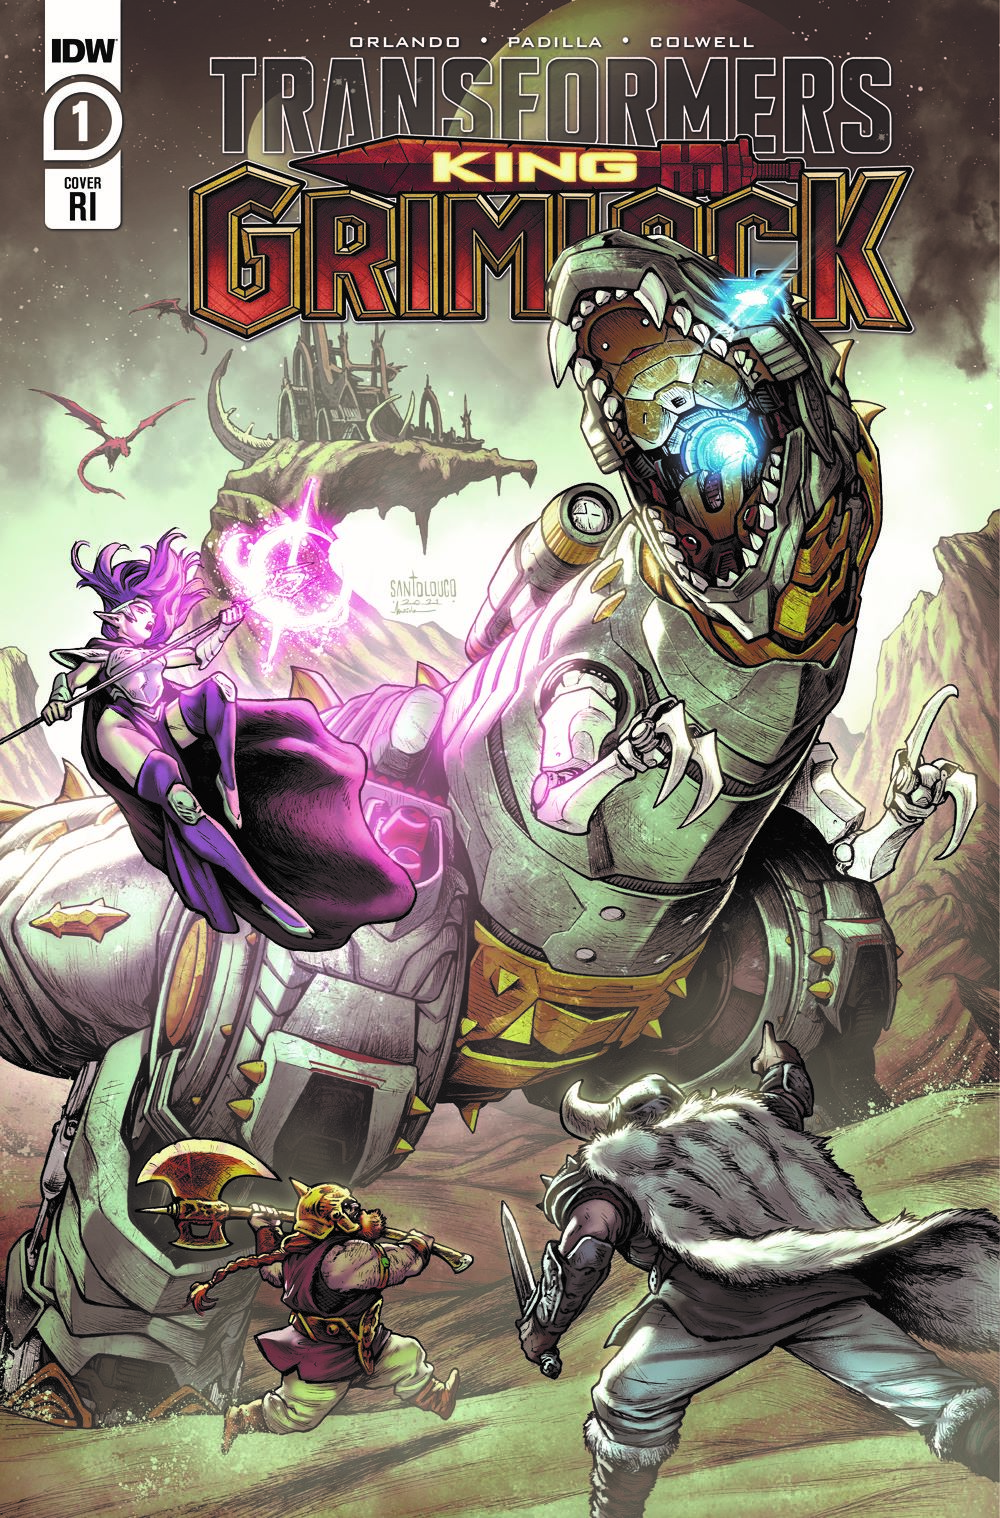 TFGrimlock-01-Cover-RI ComicList Previews: TRANSFORMERS KING GRIMLOCK #1 (OF 5)